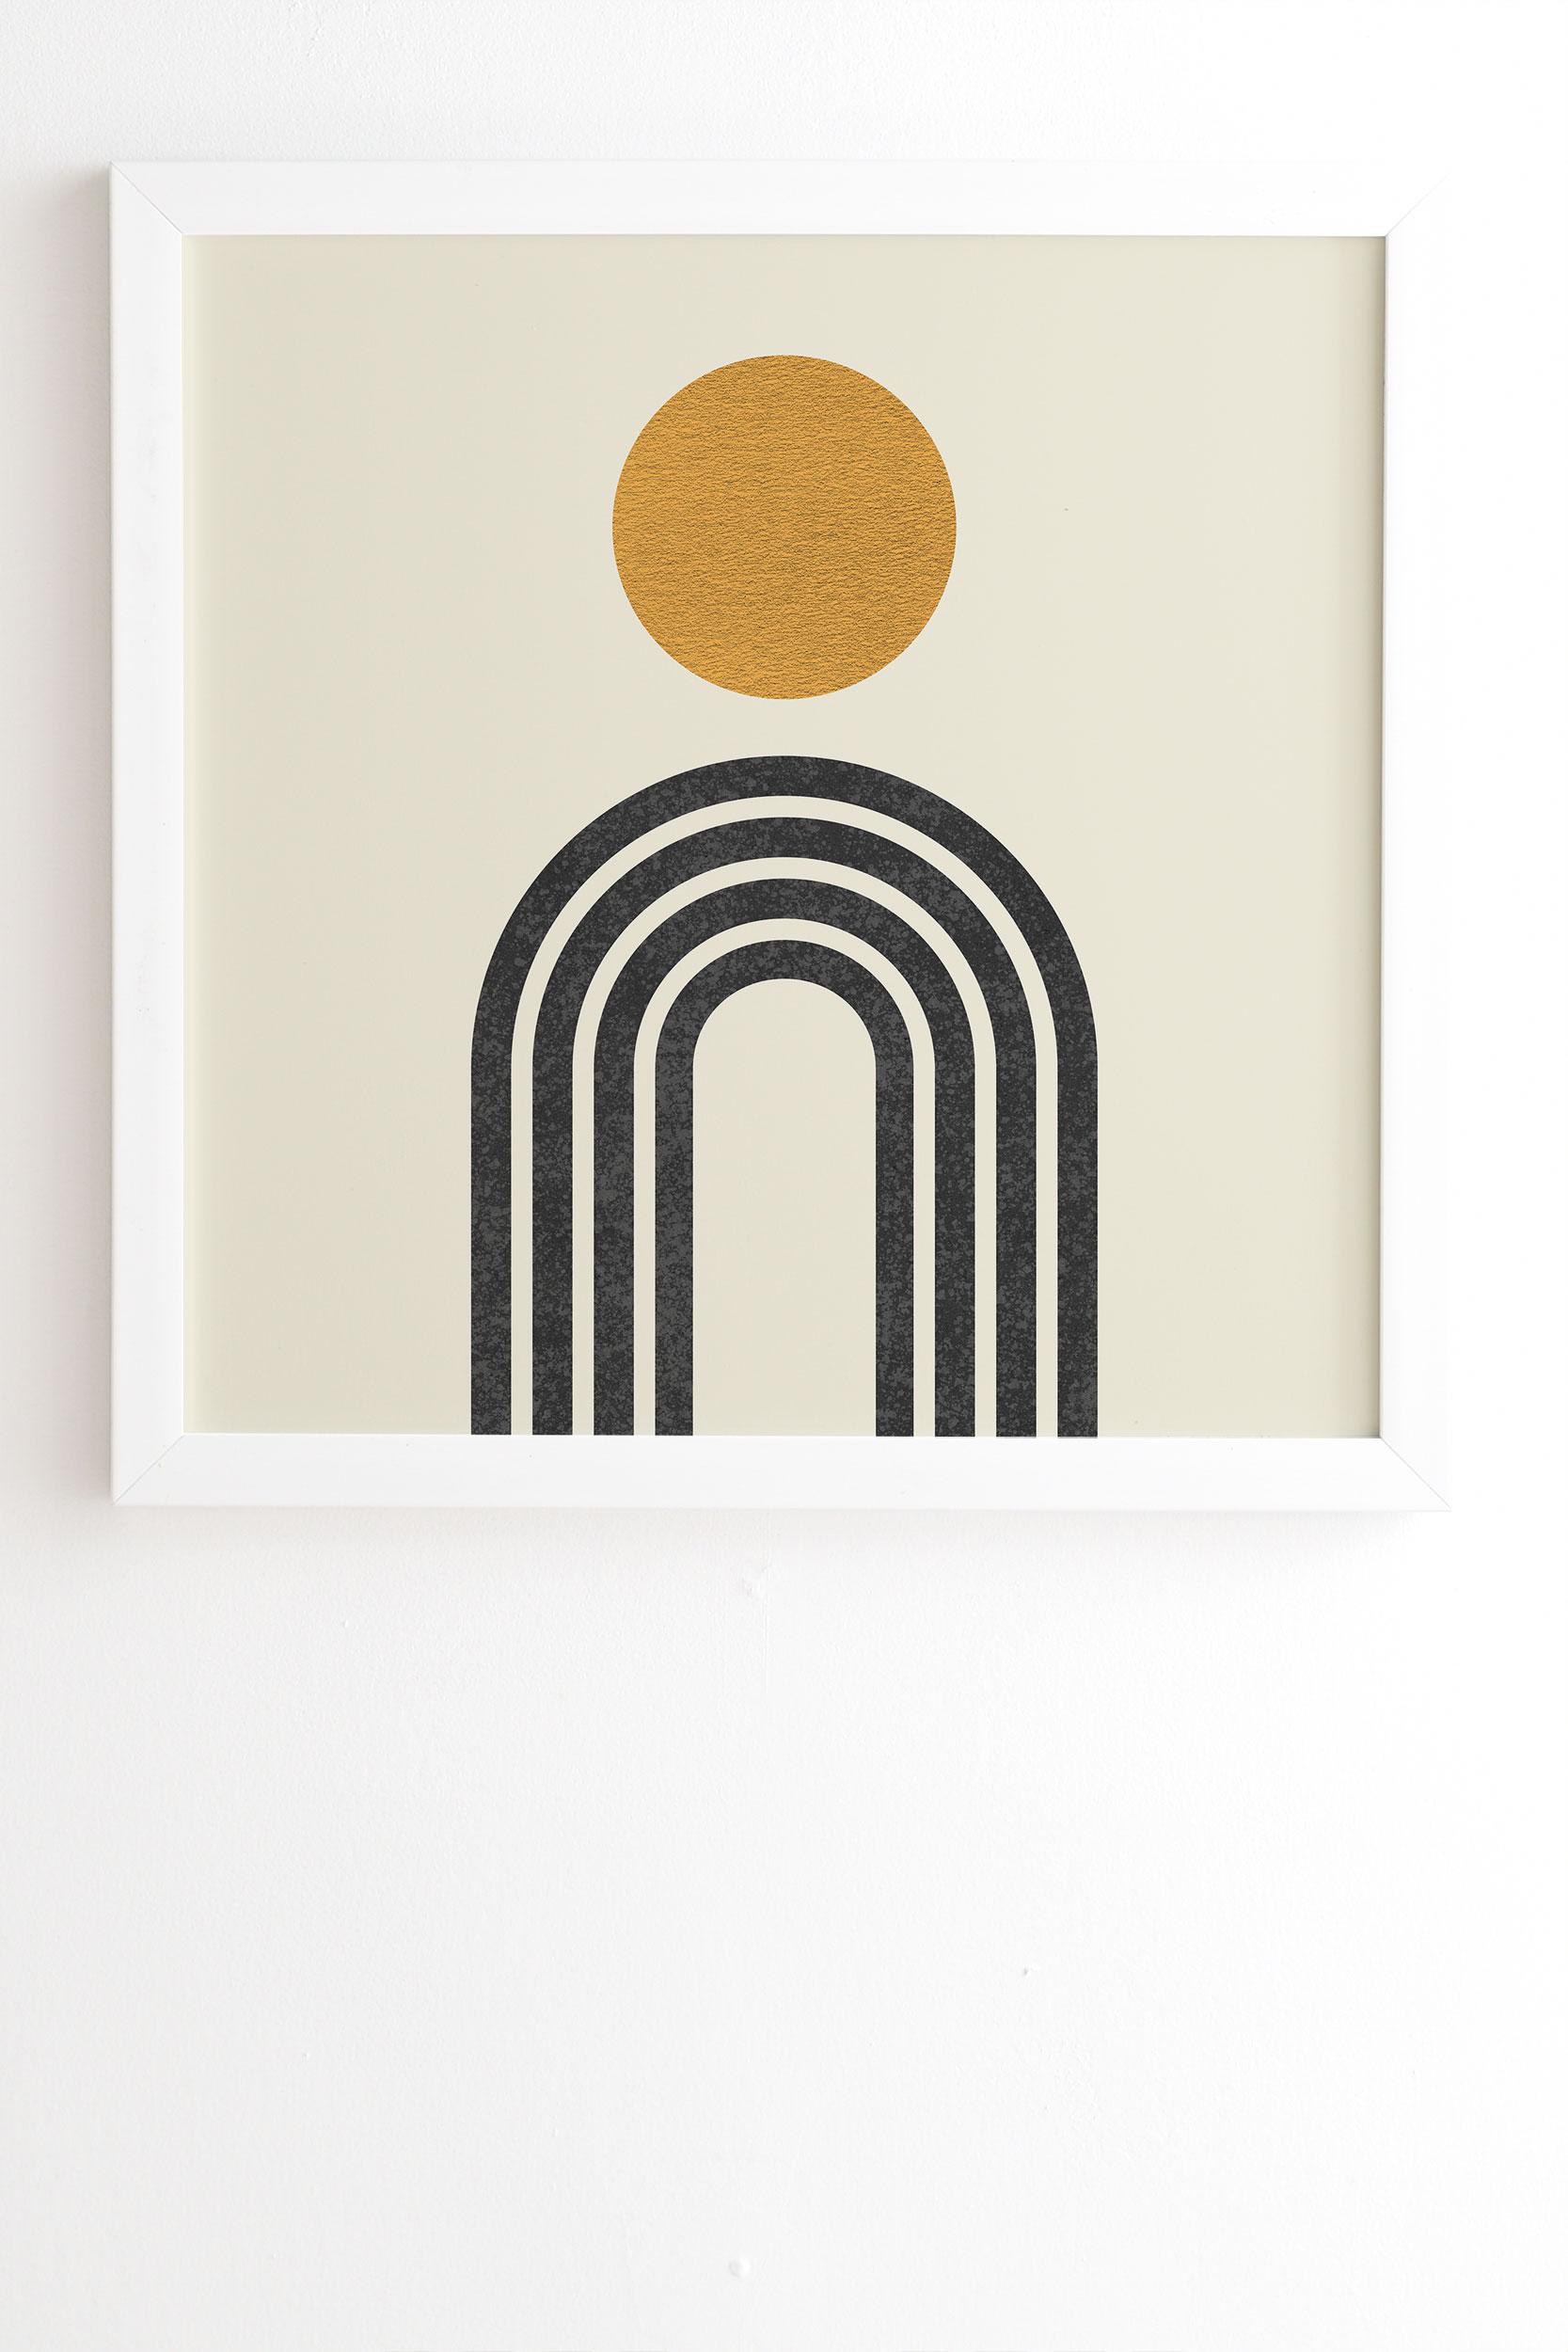 "Mid Century Modern Gold Sun by MoonlightPrint - Framed Wall Art Basic White 19"" x 22.4"""